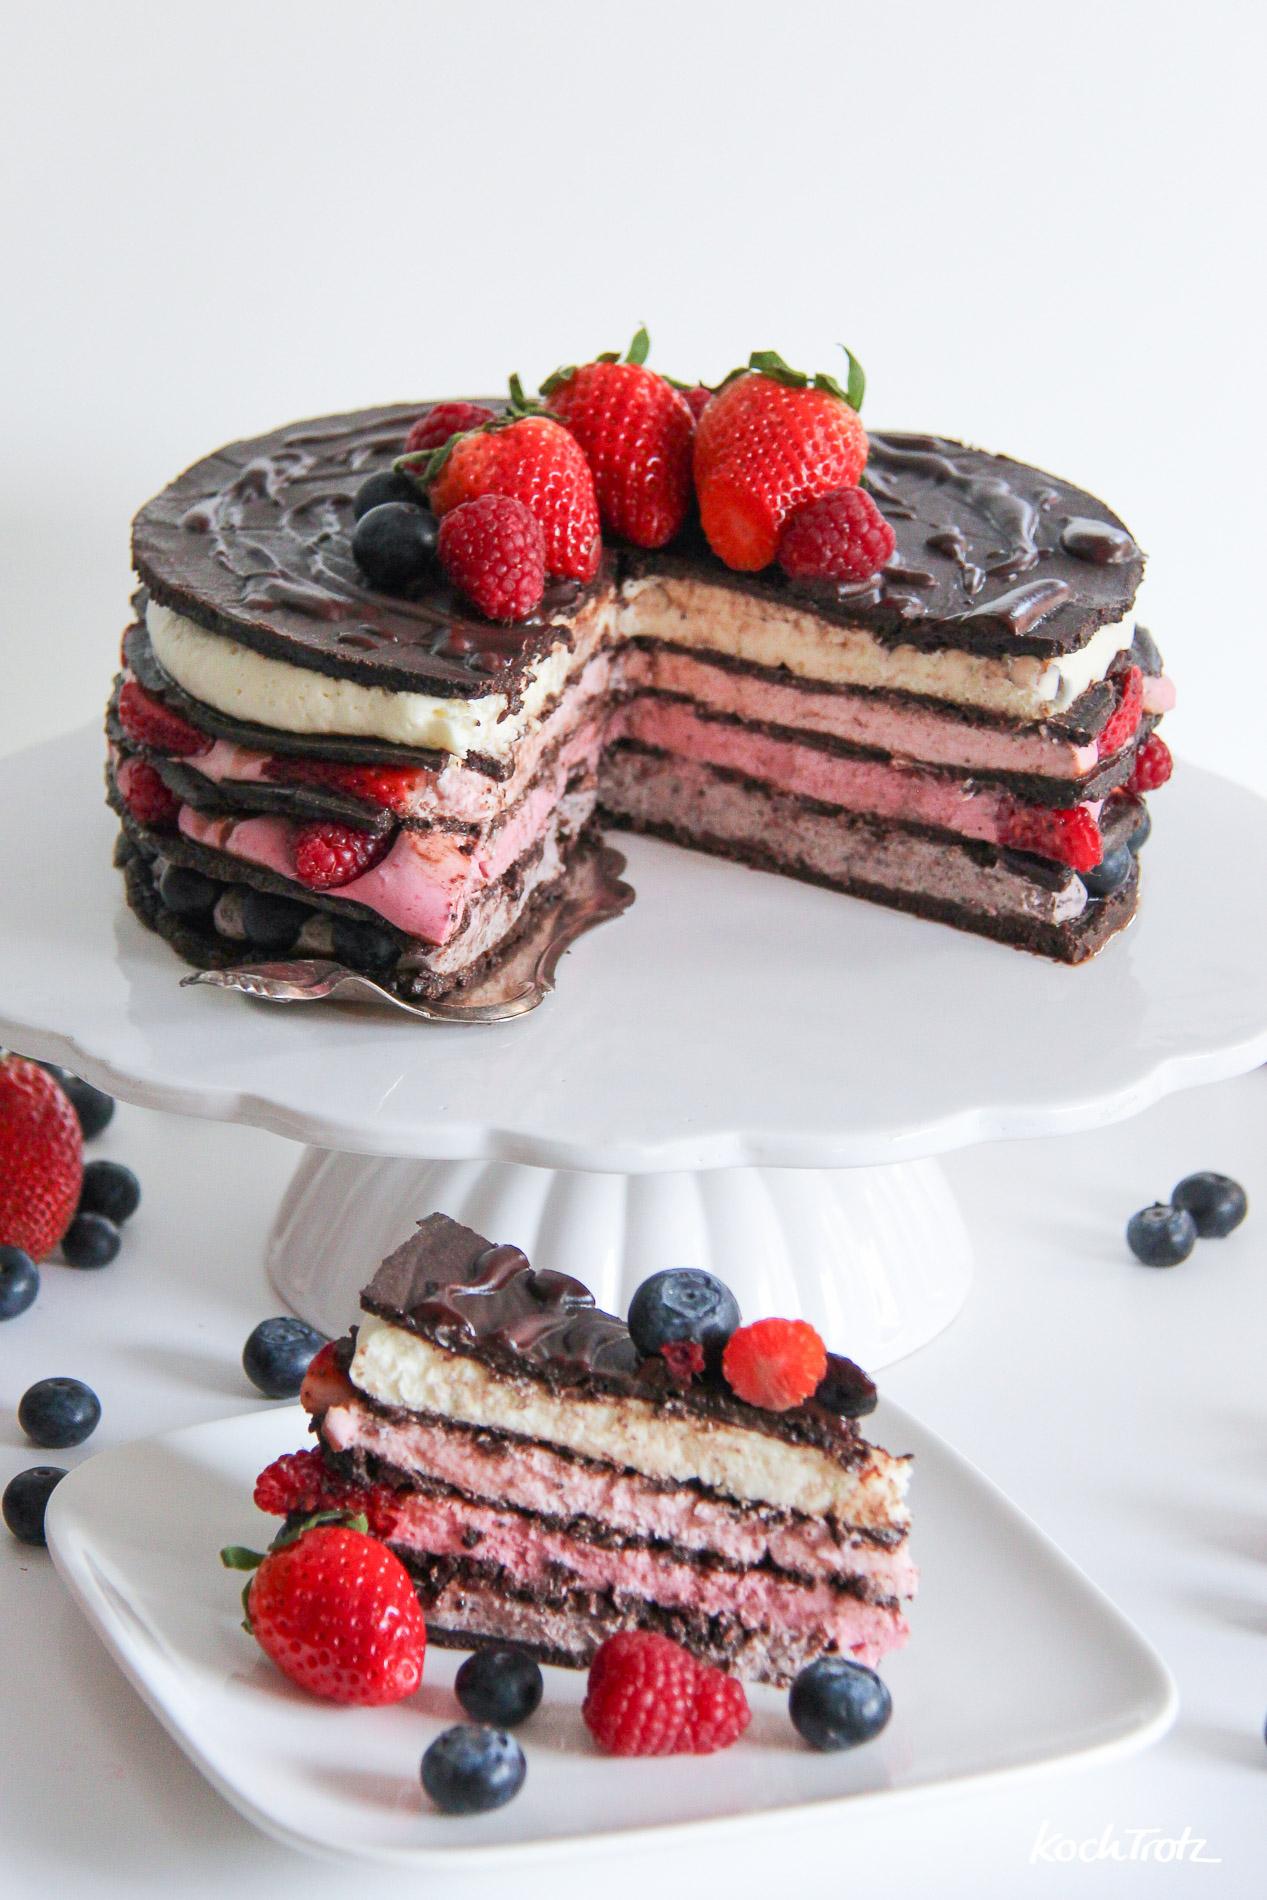 3-pauly-cremeo-torte-naked-cake-no-bake-glutenfrei-laktosefrei-28